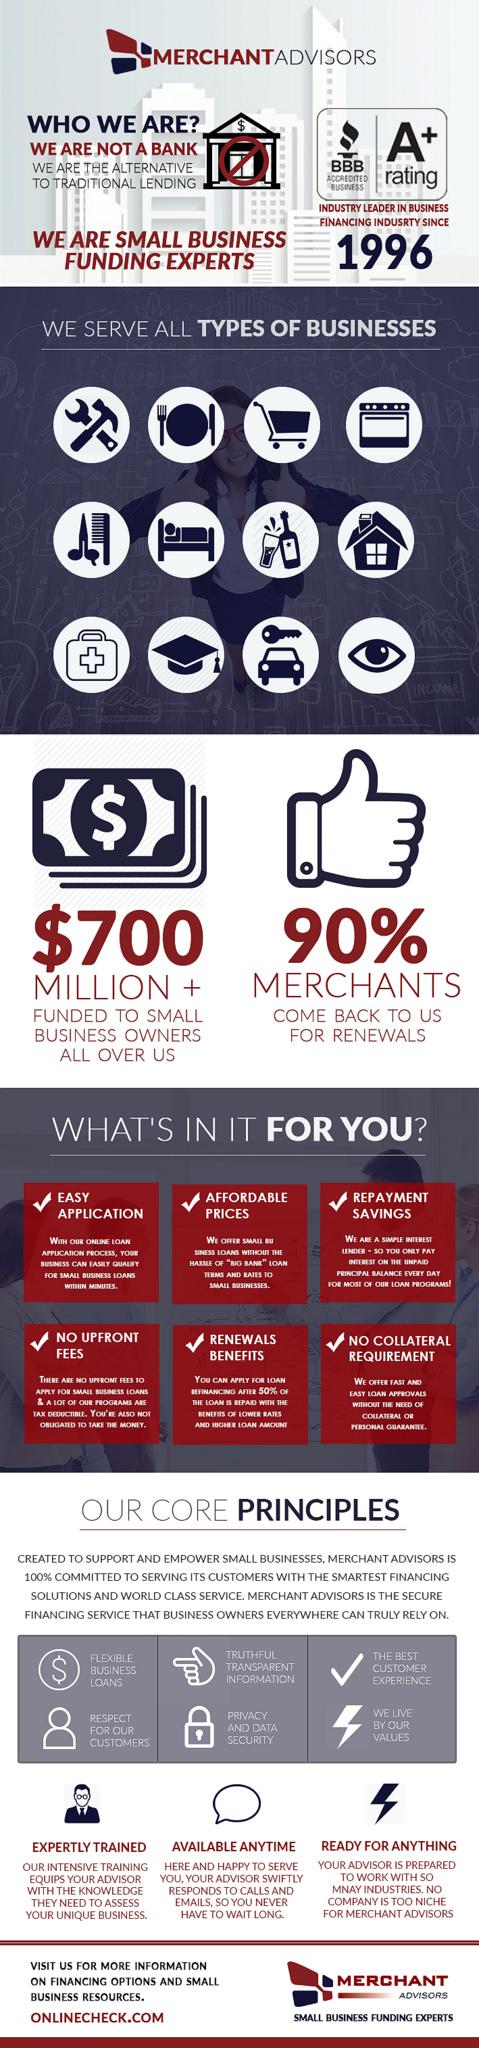 Merchant Advisors - The Alternative To Traditional Lending ...